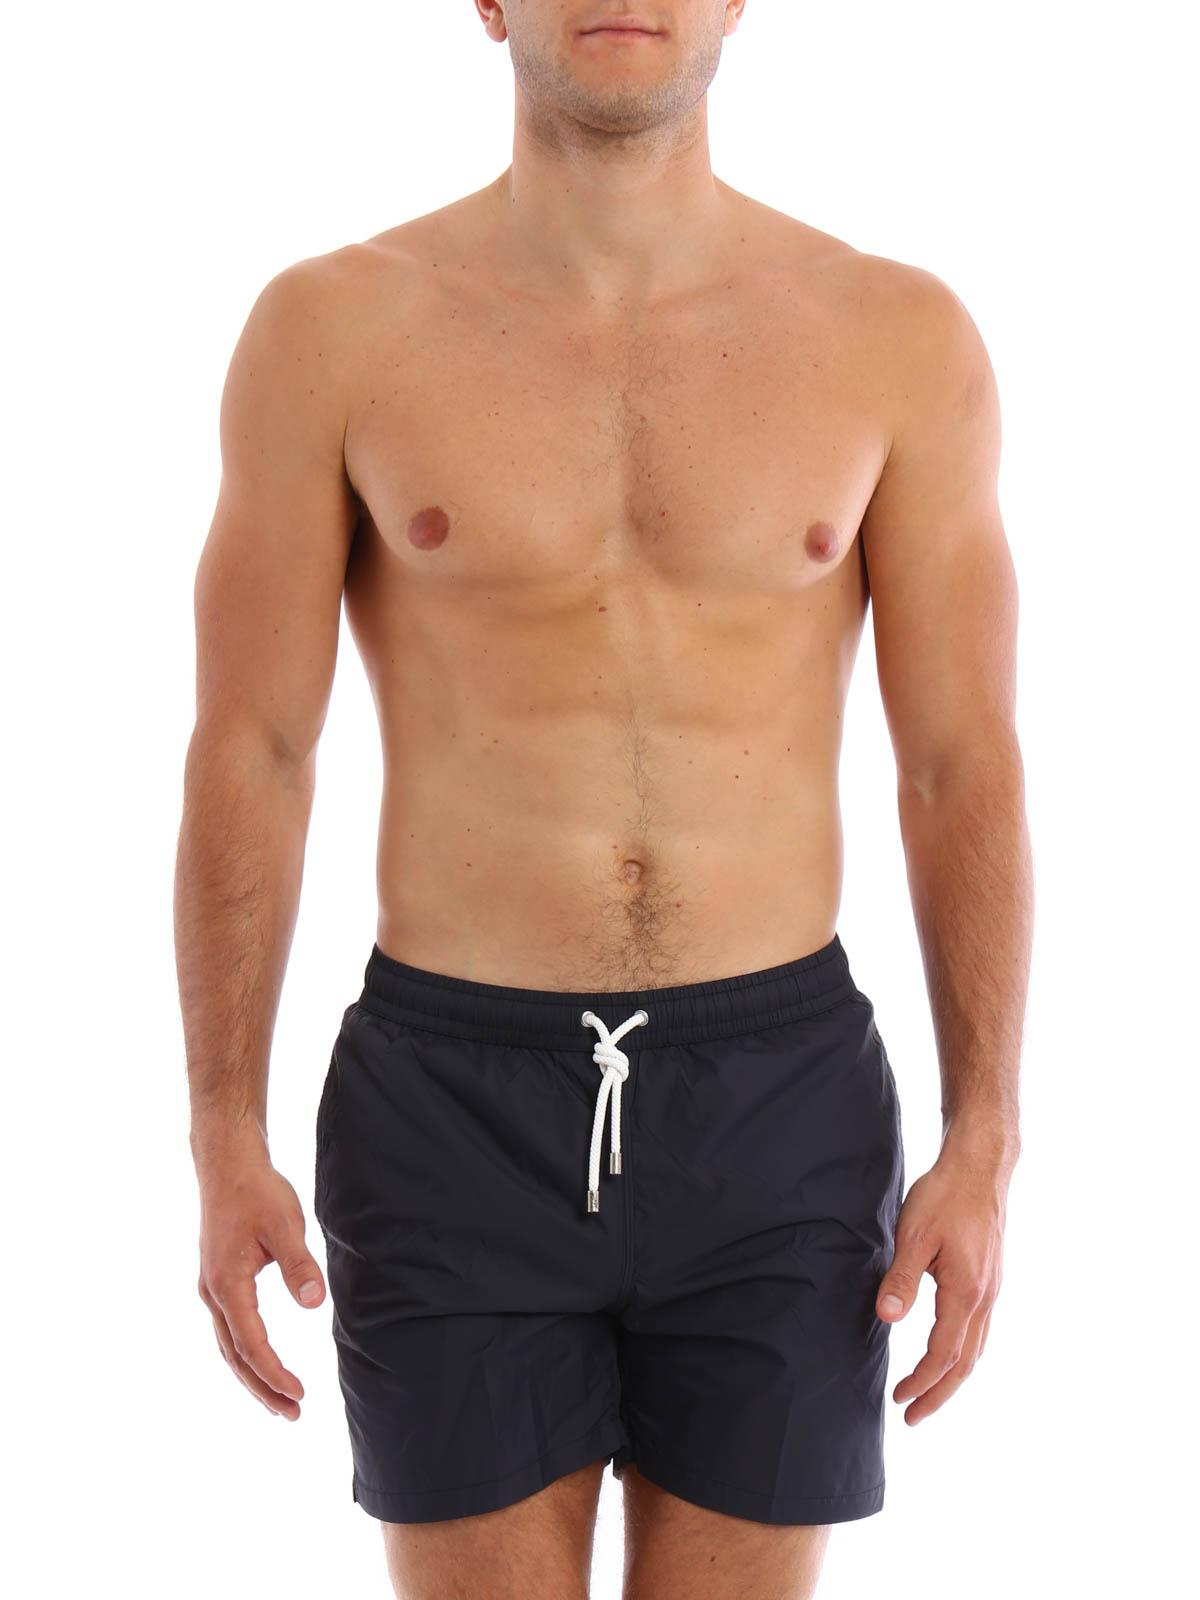 7885bcf2a6322 HARTFORD: Swim shorts & swimming trunks online - Ultralight nylon swim  shorts